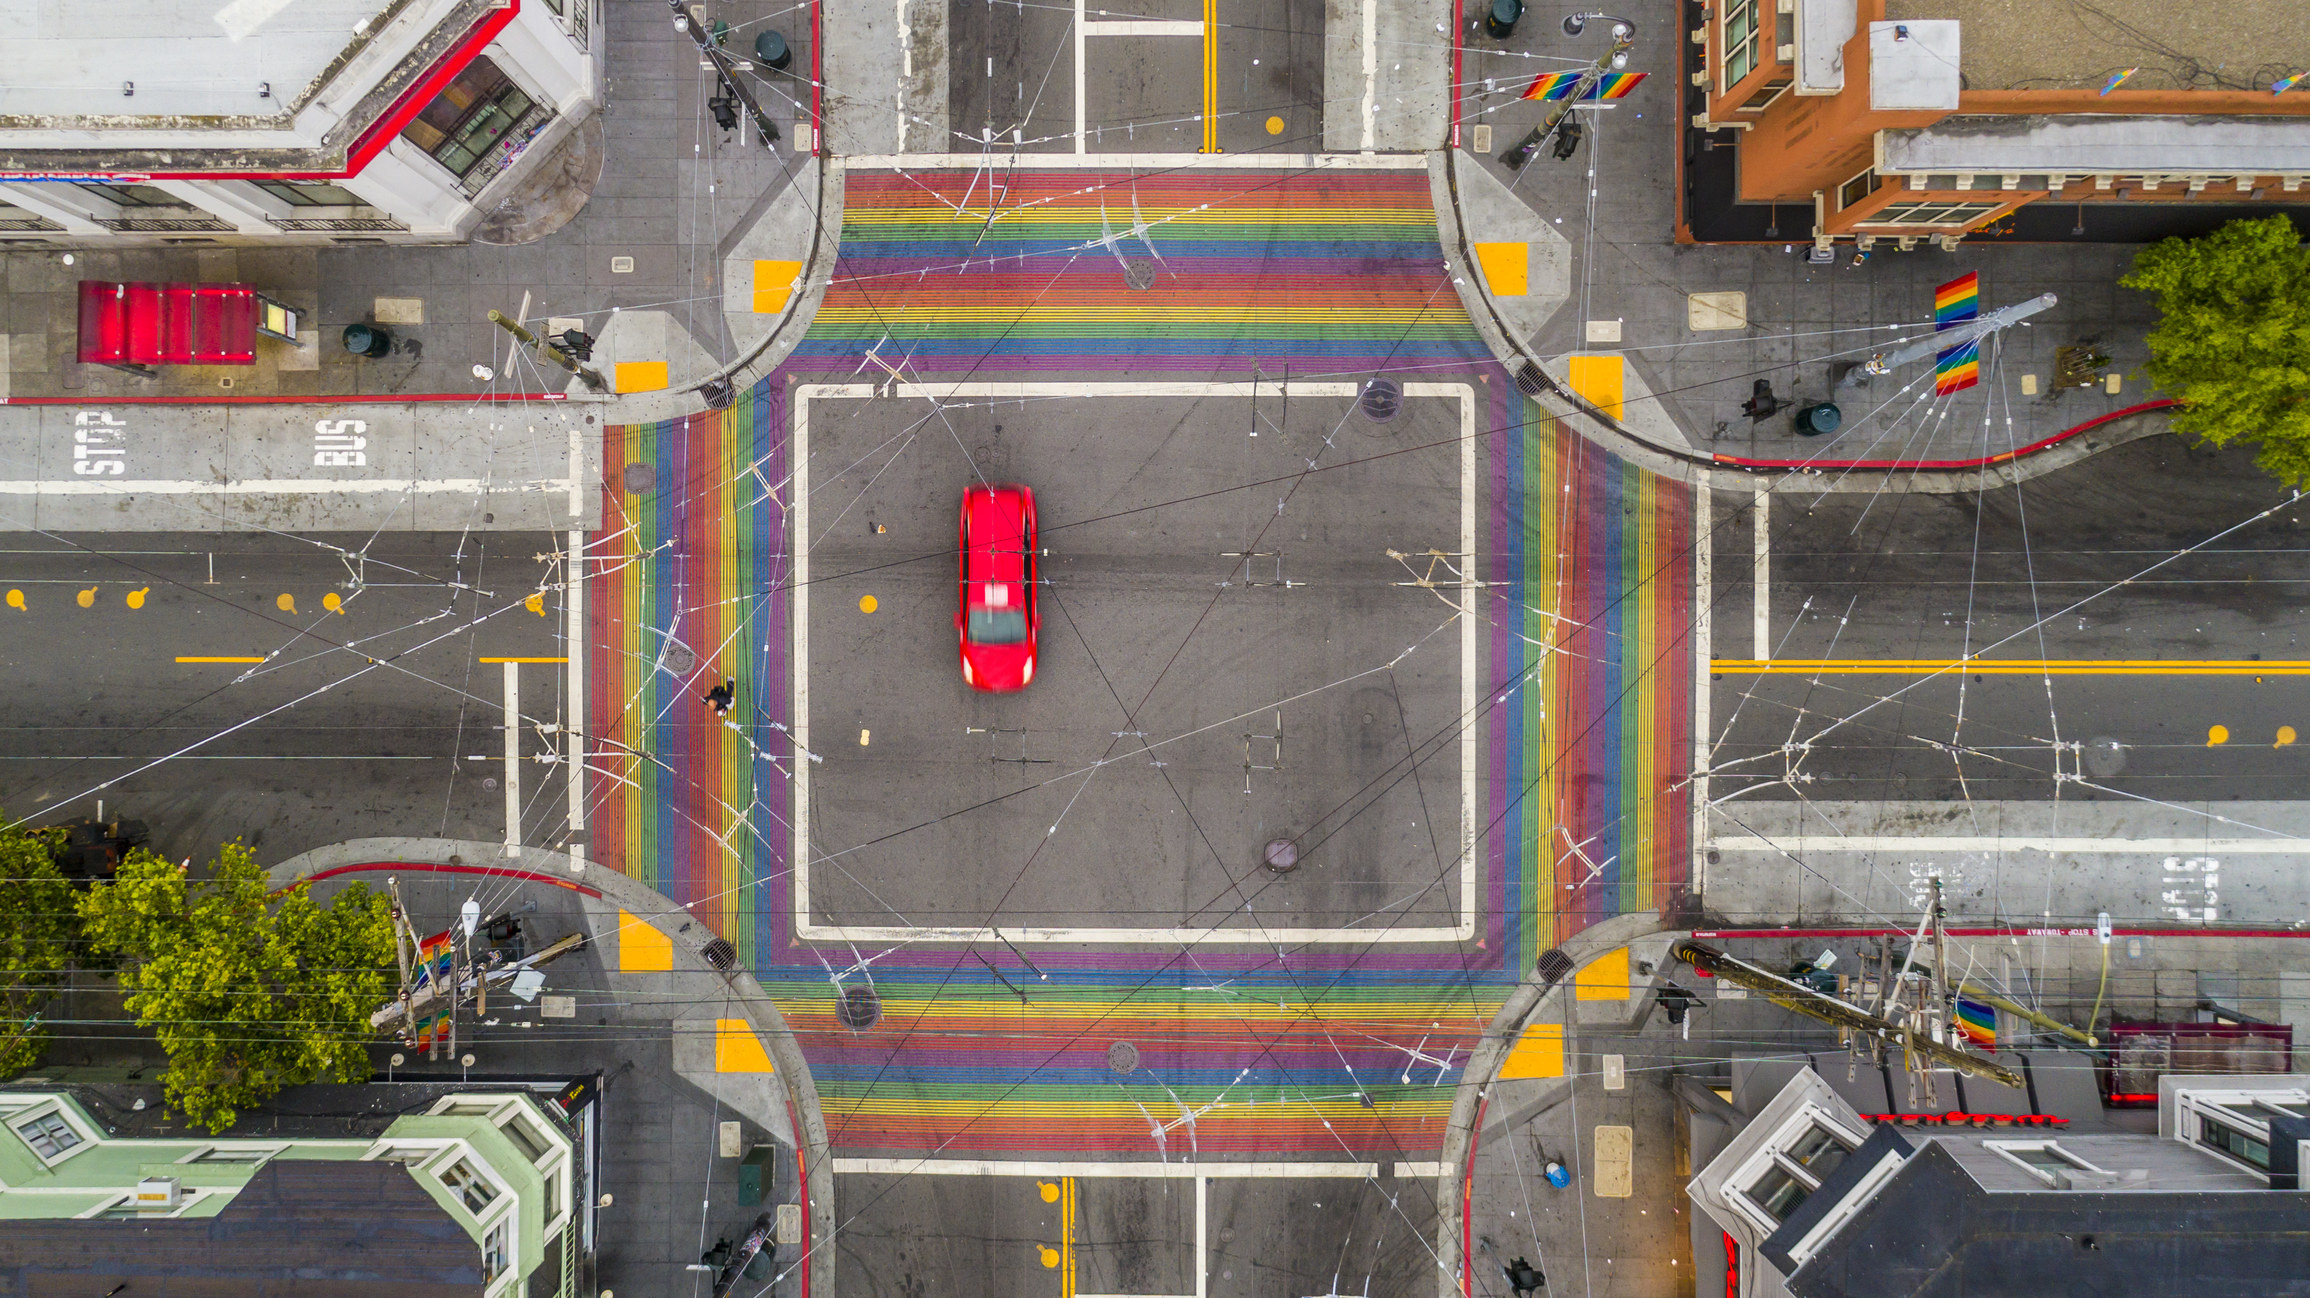 Aerial photo of the Castro District in San Francisco, California